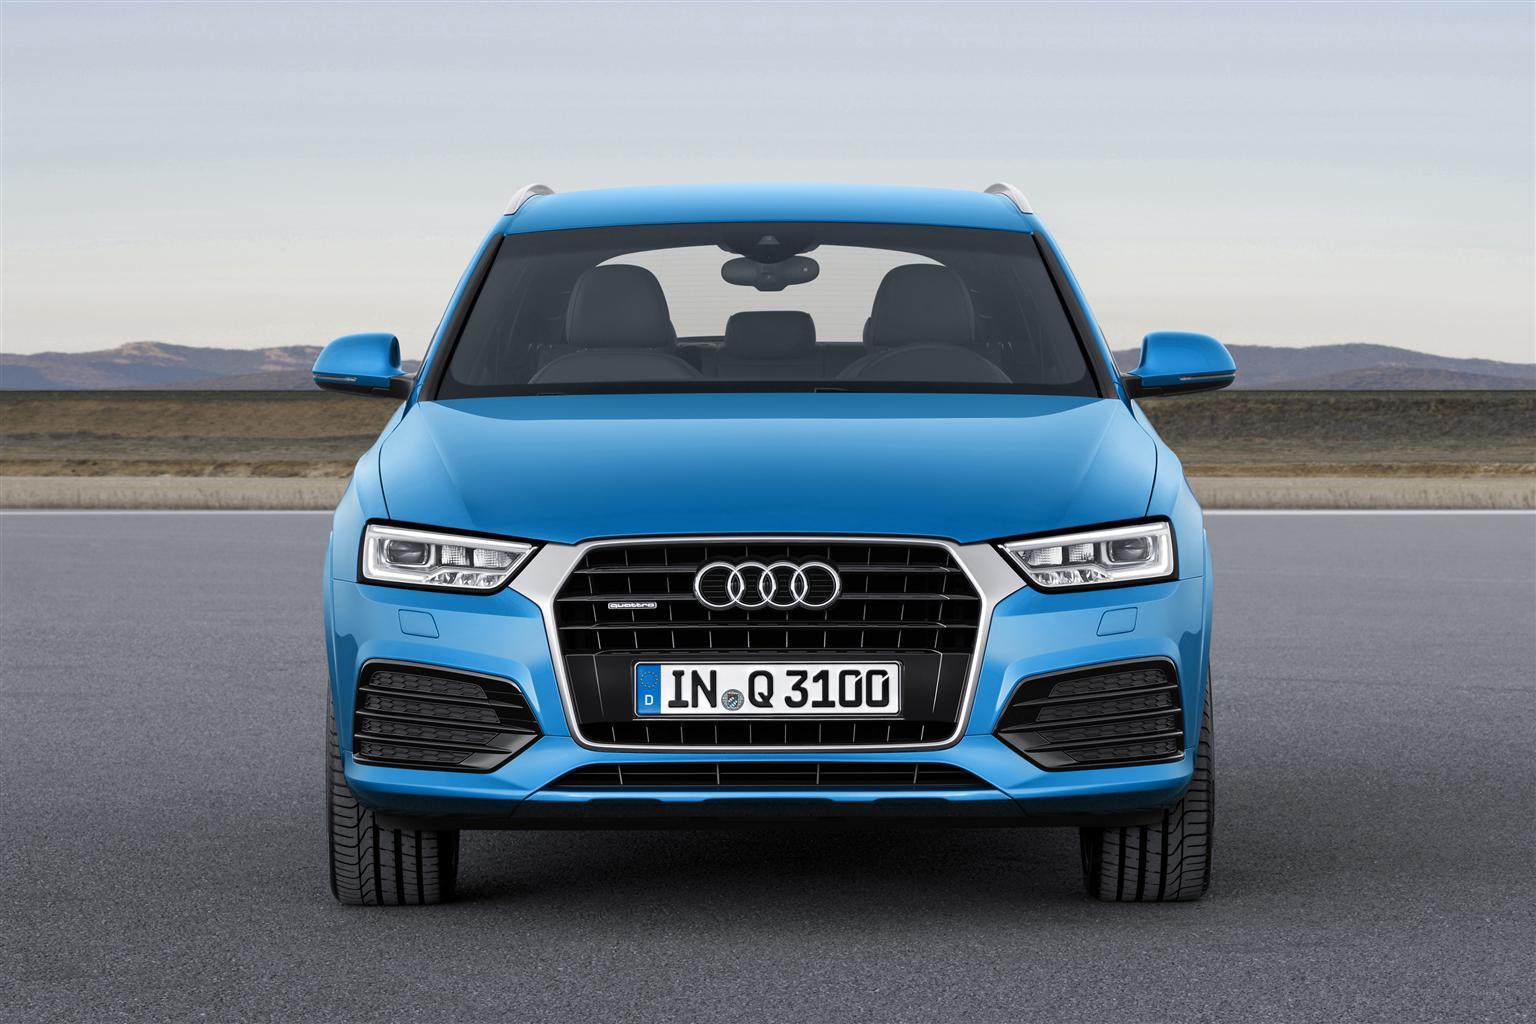 Audi Q3 si migliora ulteriormente